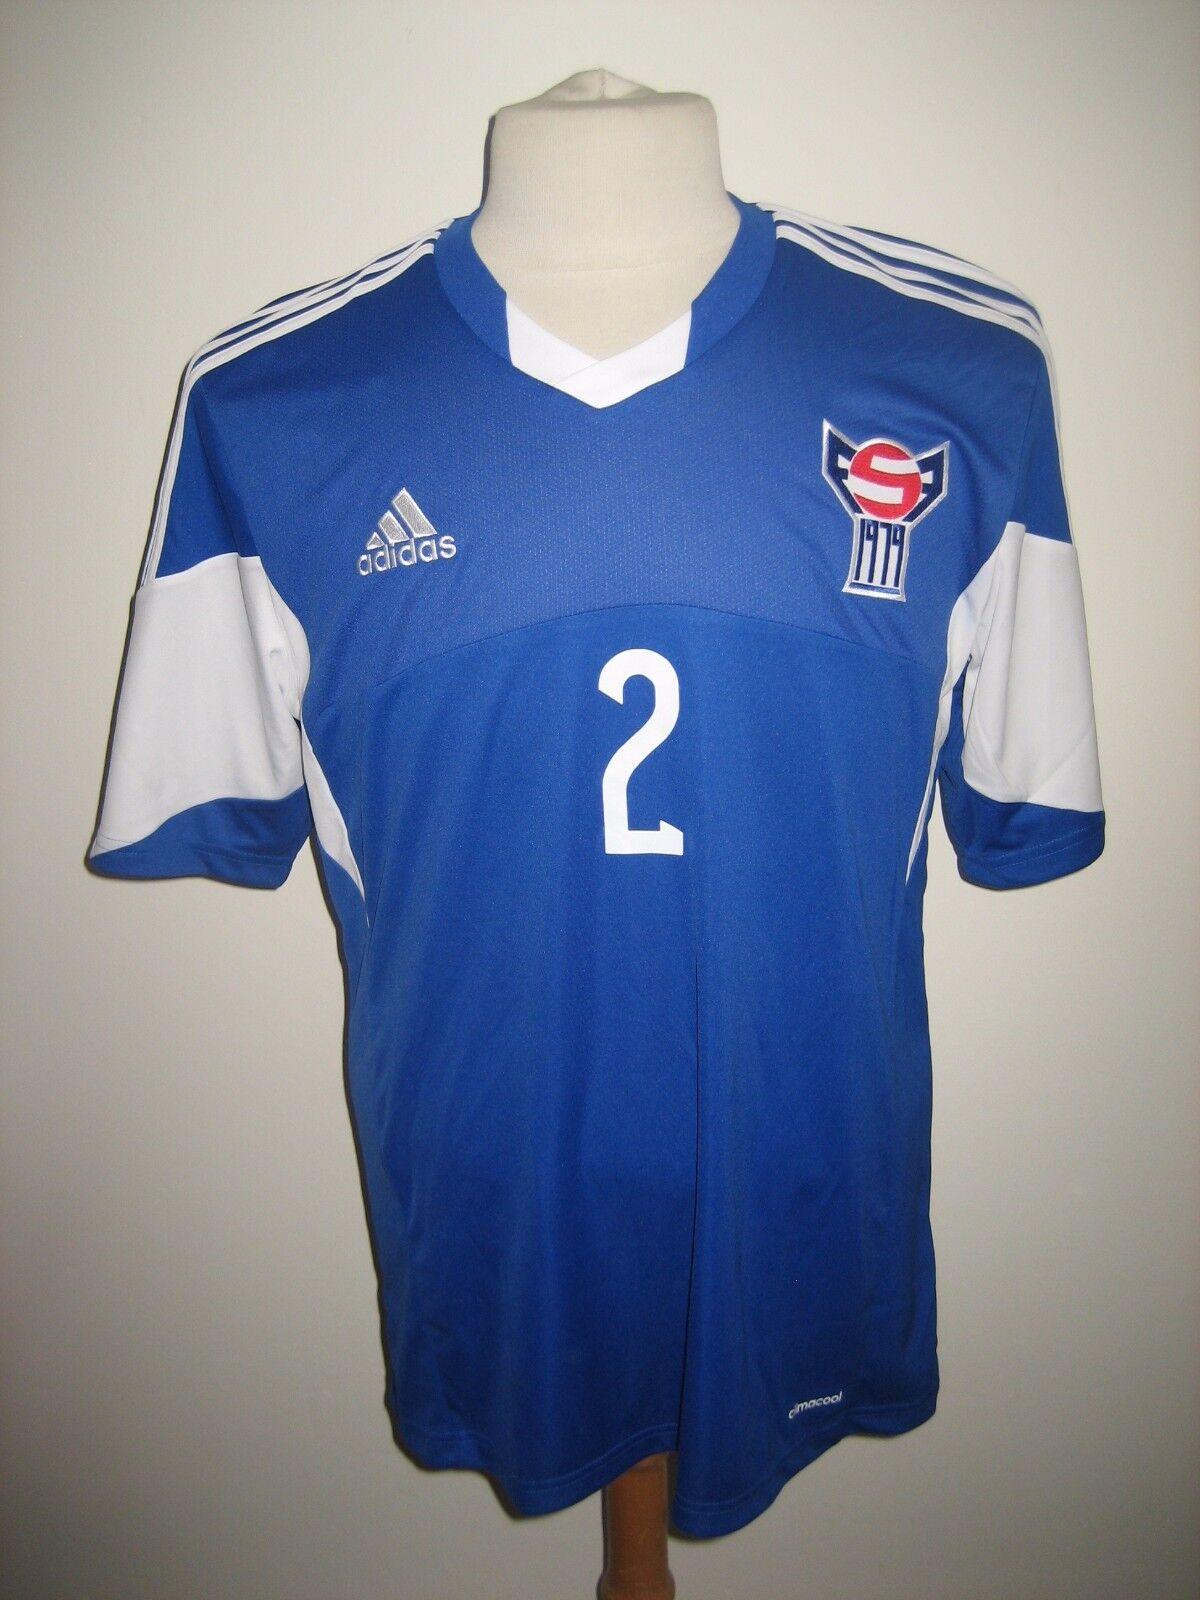 Faroe Islands MATCH WORN football shirt soccer jersey maillot trikot Dimensione L